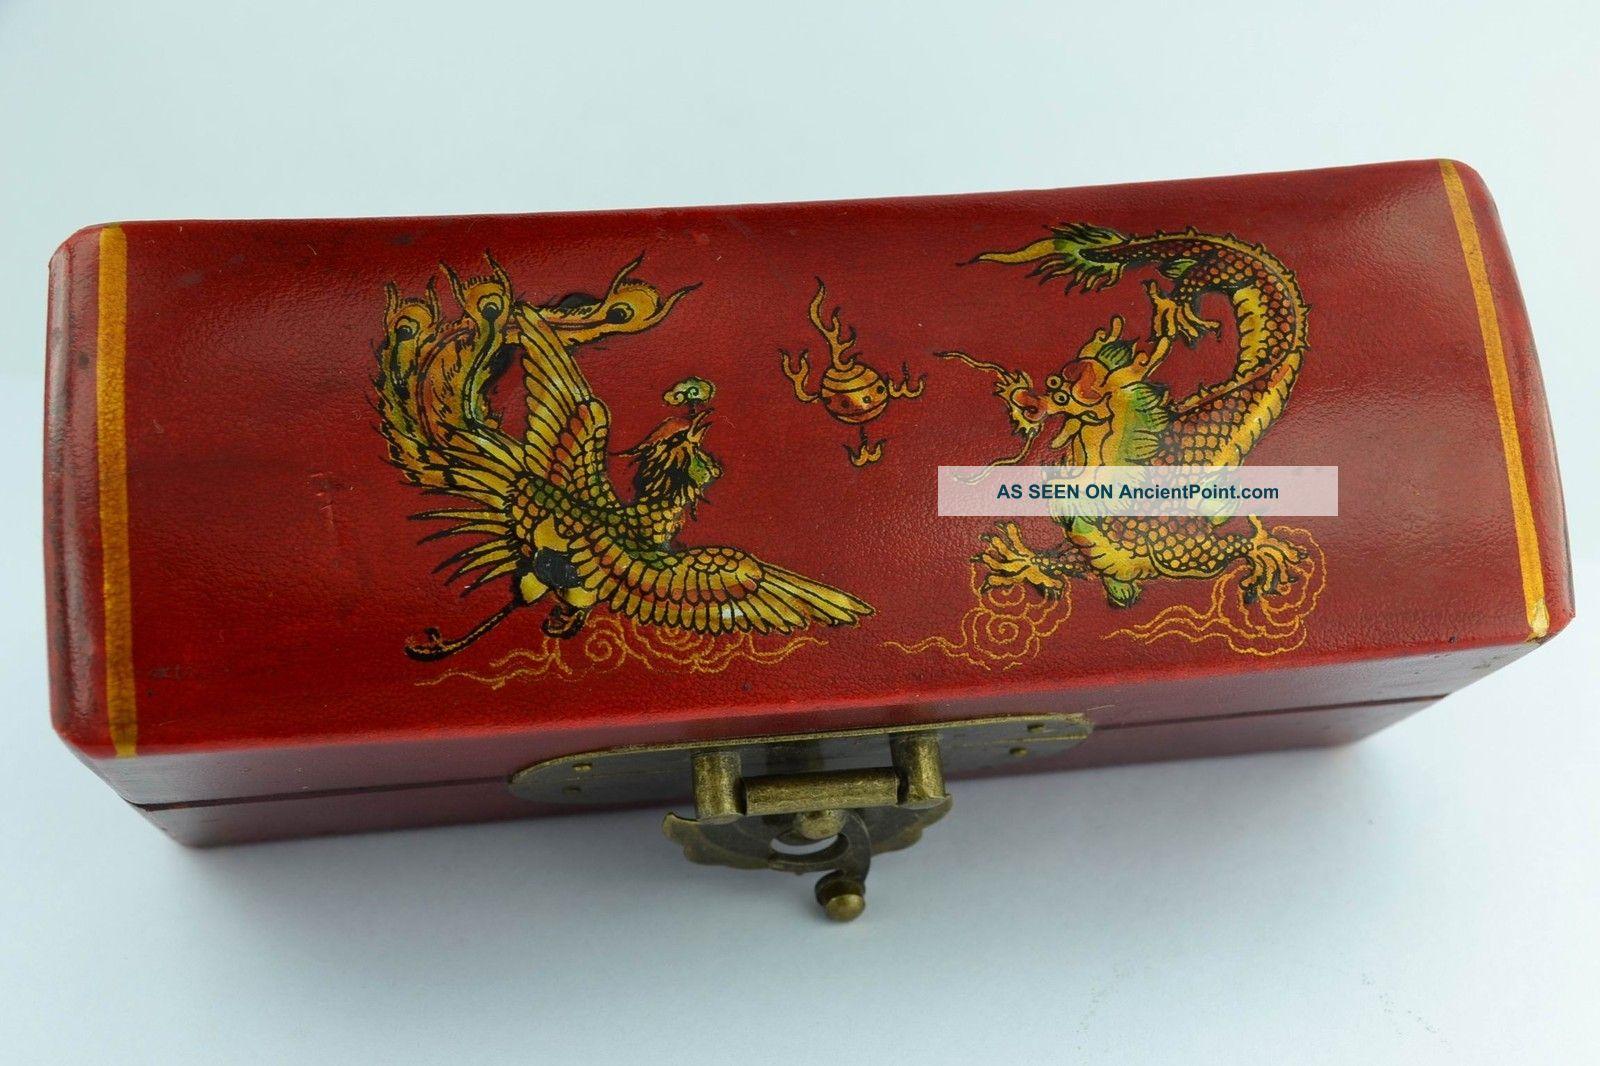 Asian Old Collectibles Decorated Handwork Wood Dragon Phoenix Jewel Box Aaaaa Boxes photo